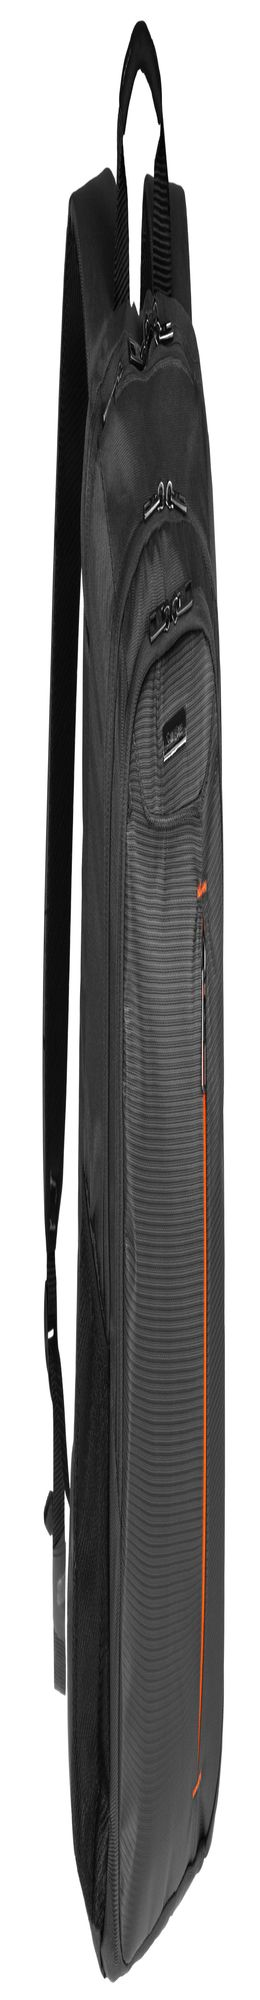 Рюкзак для ноутбука GuardIT, серый фото